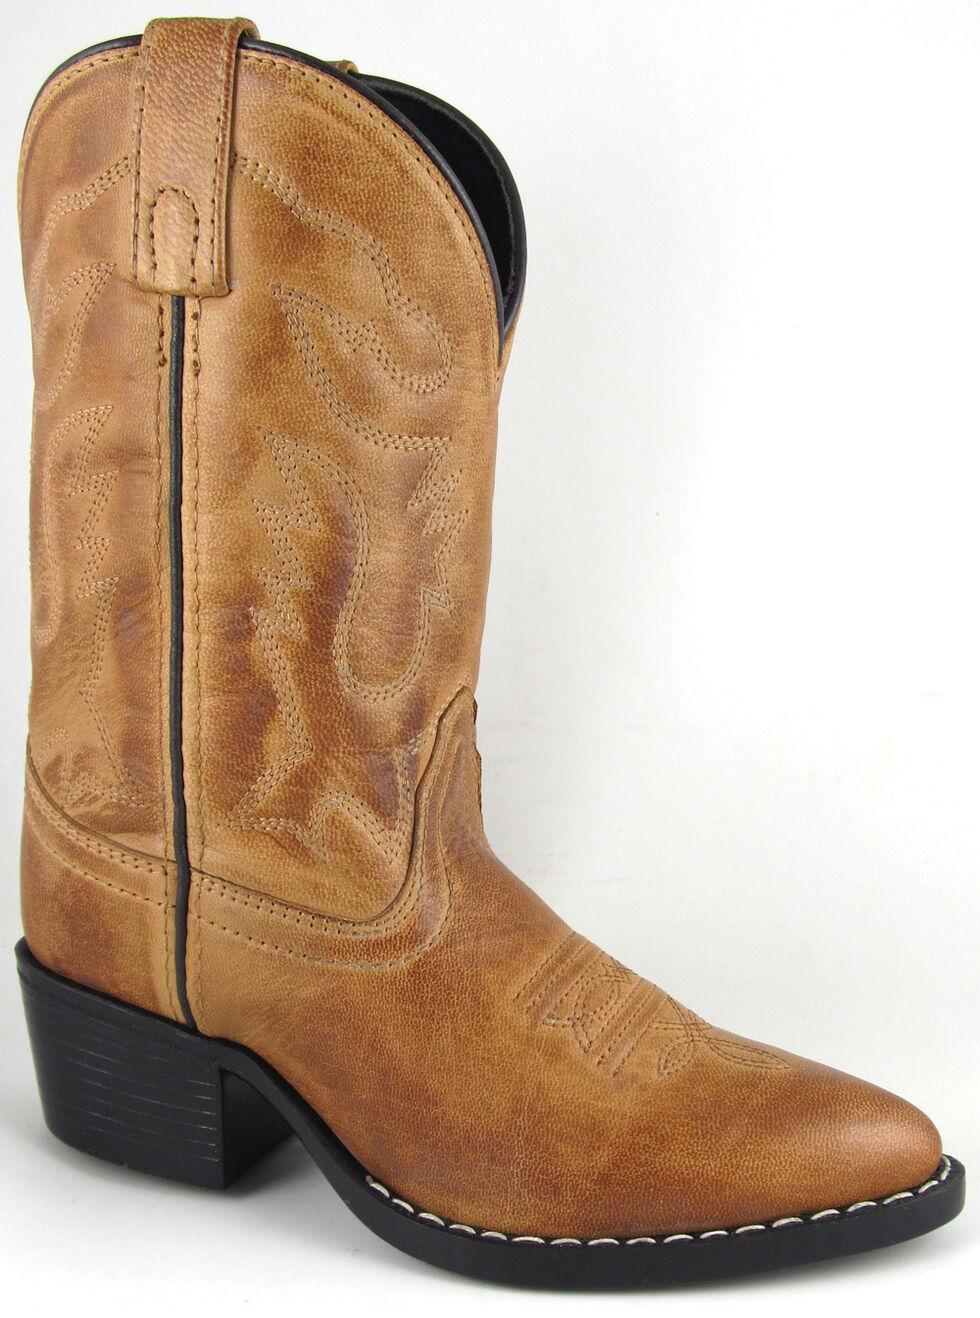 Smoky Mountain Boys' Dakota Western Boots - Medium Toe, Tan, hi-res